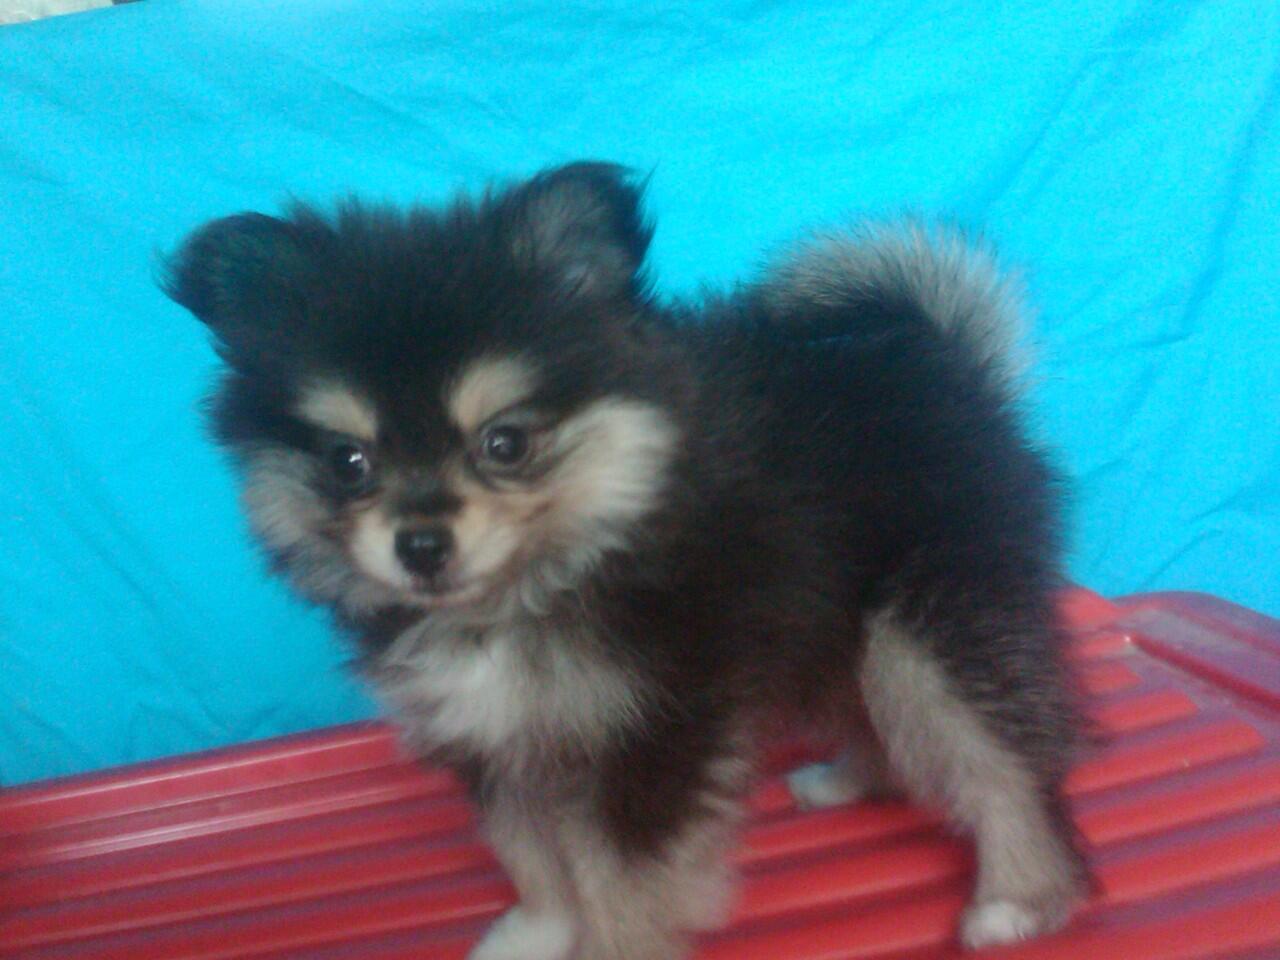 Anjing mini pom puppy